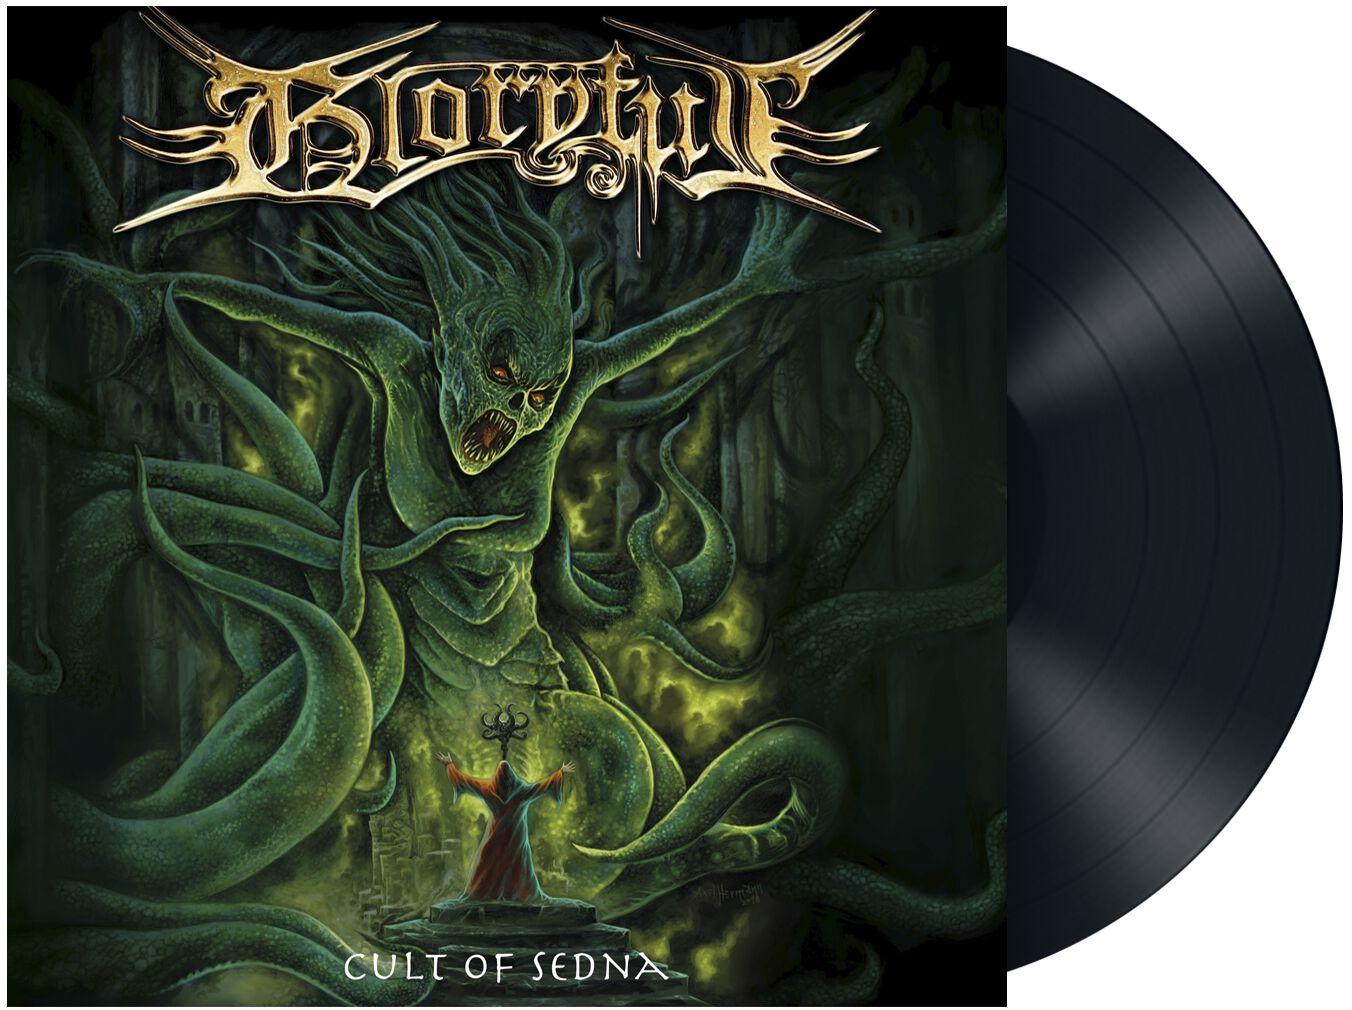 Gloryful Cult of sedna LP schwarz MASL 1040